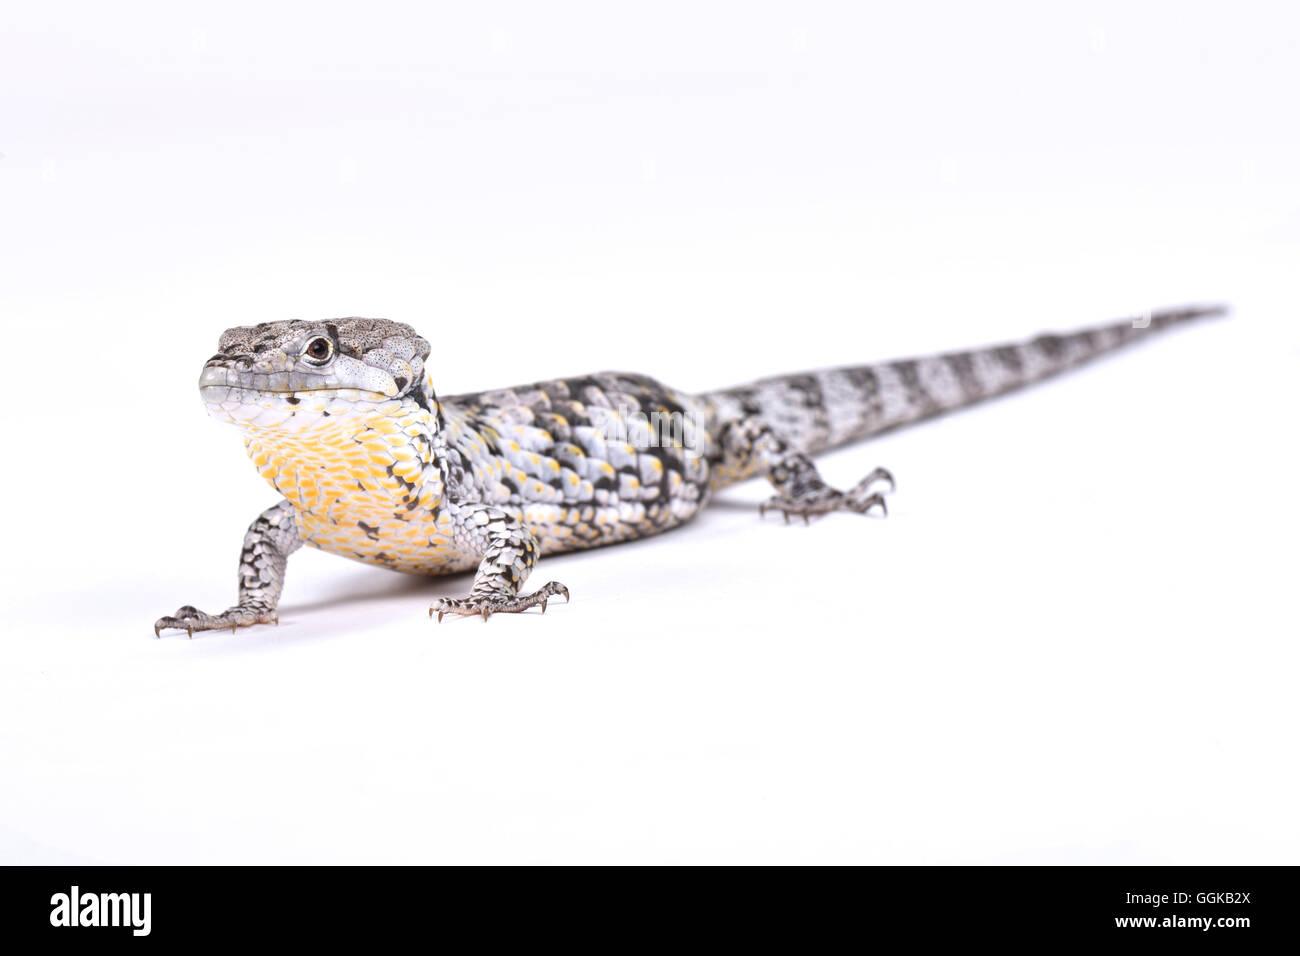 Deppe's Arboreal Alligator  (Abronia deppii) - Stock Image